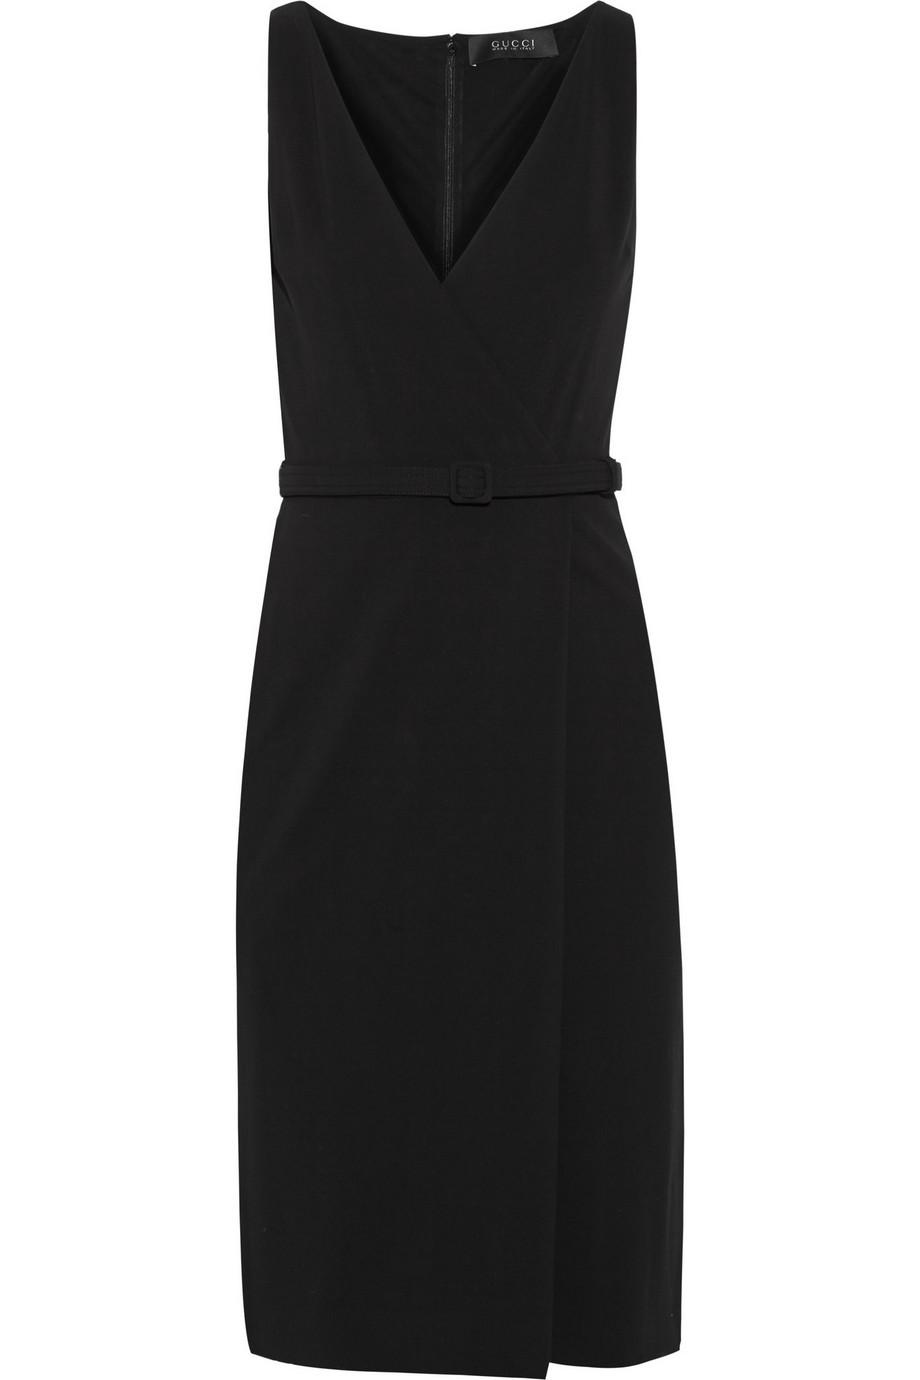 Gucci Wrap-Effect Stretch-Crepe Dress, Size: L